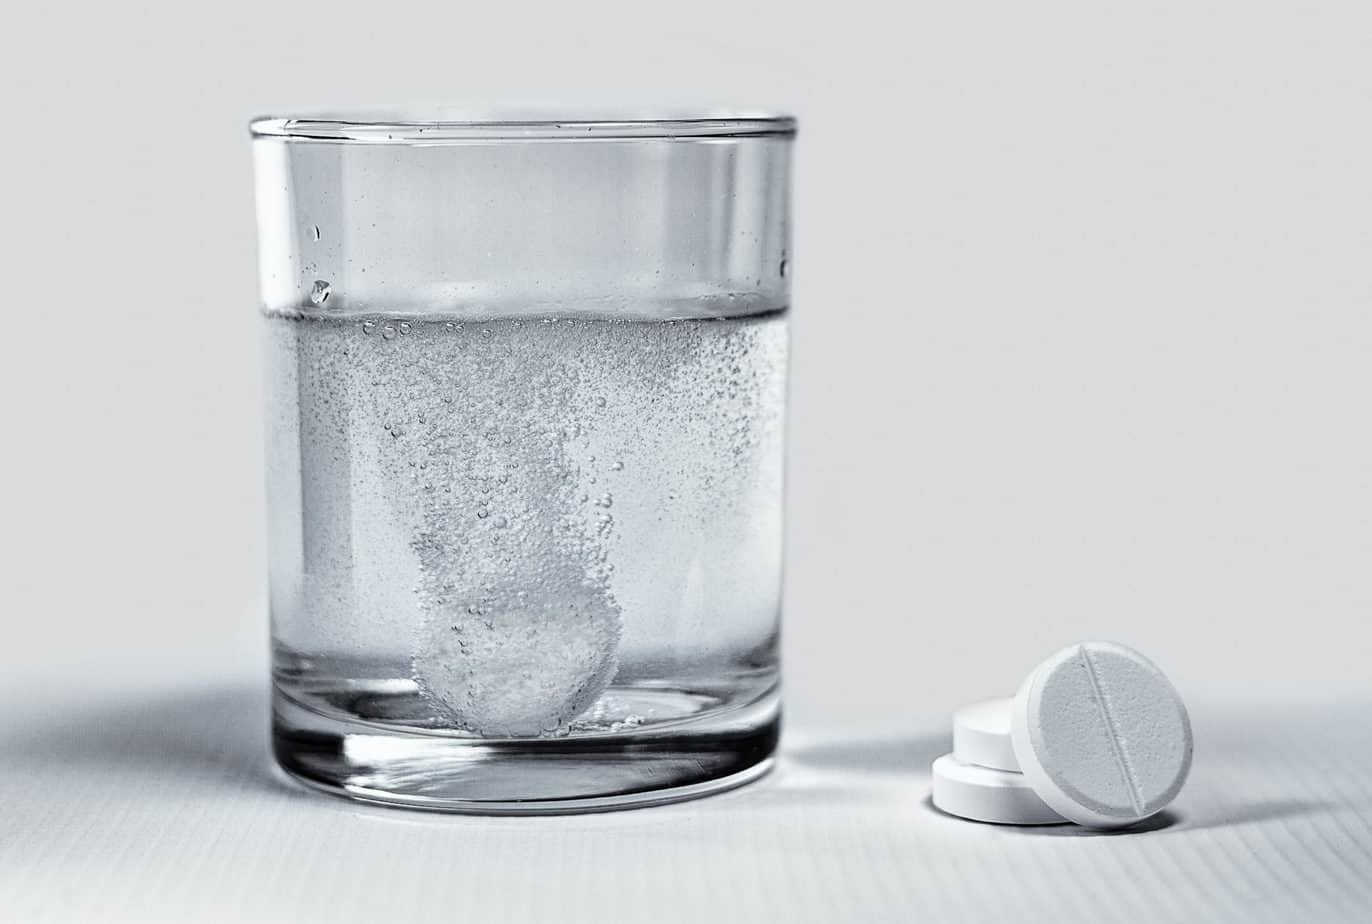 medicines disposal environmental effects